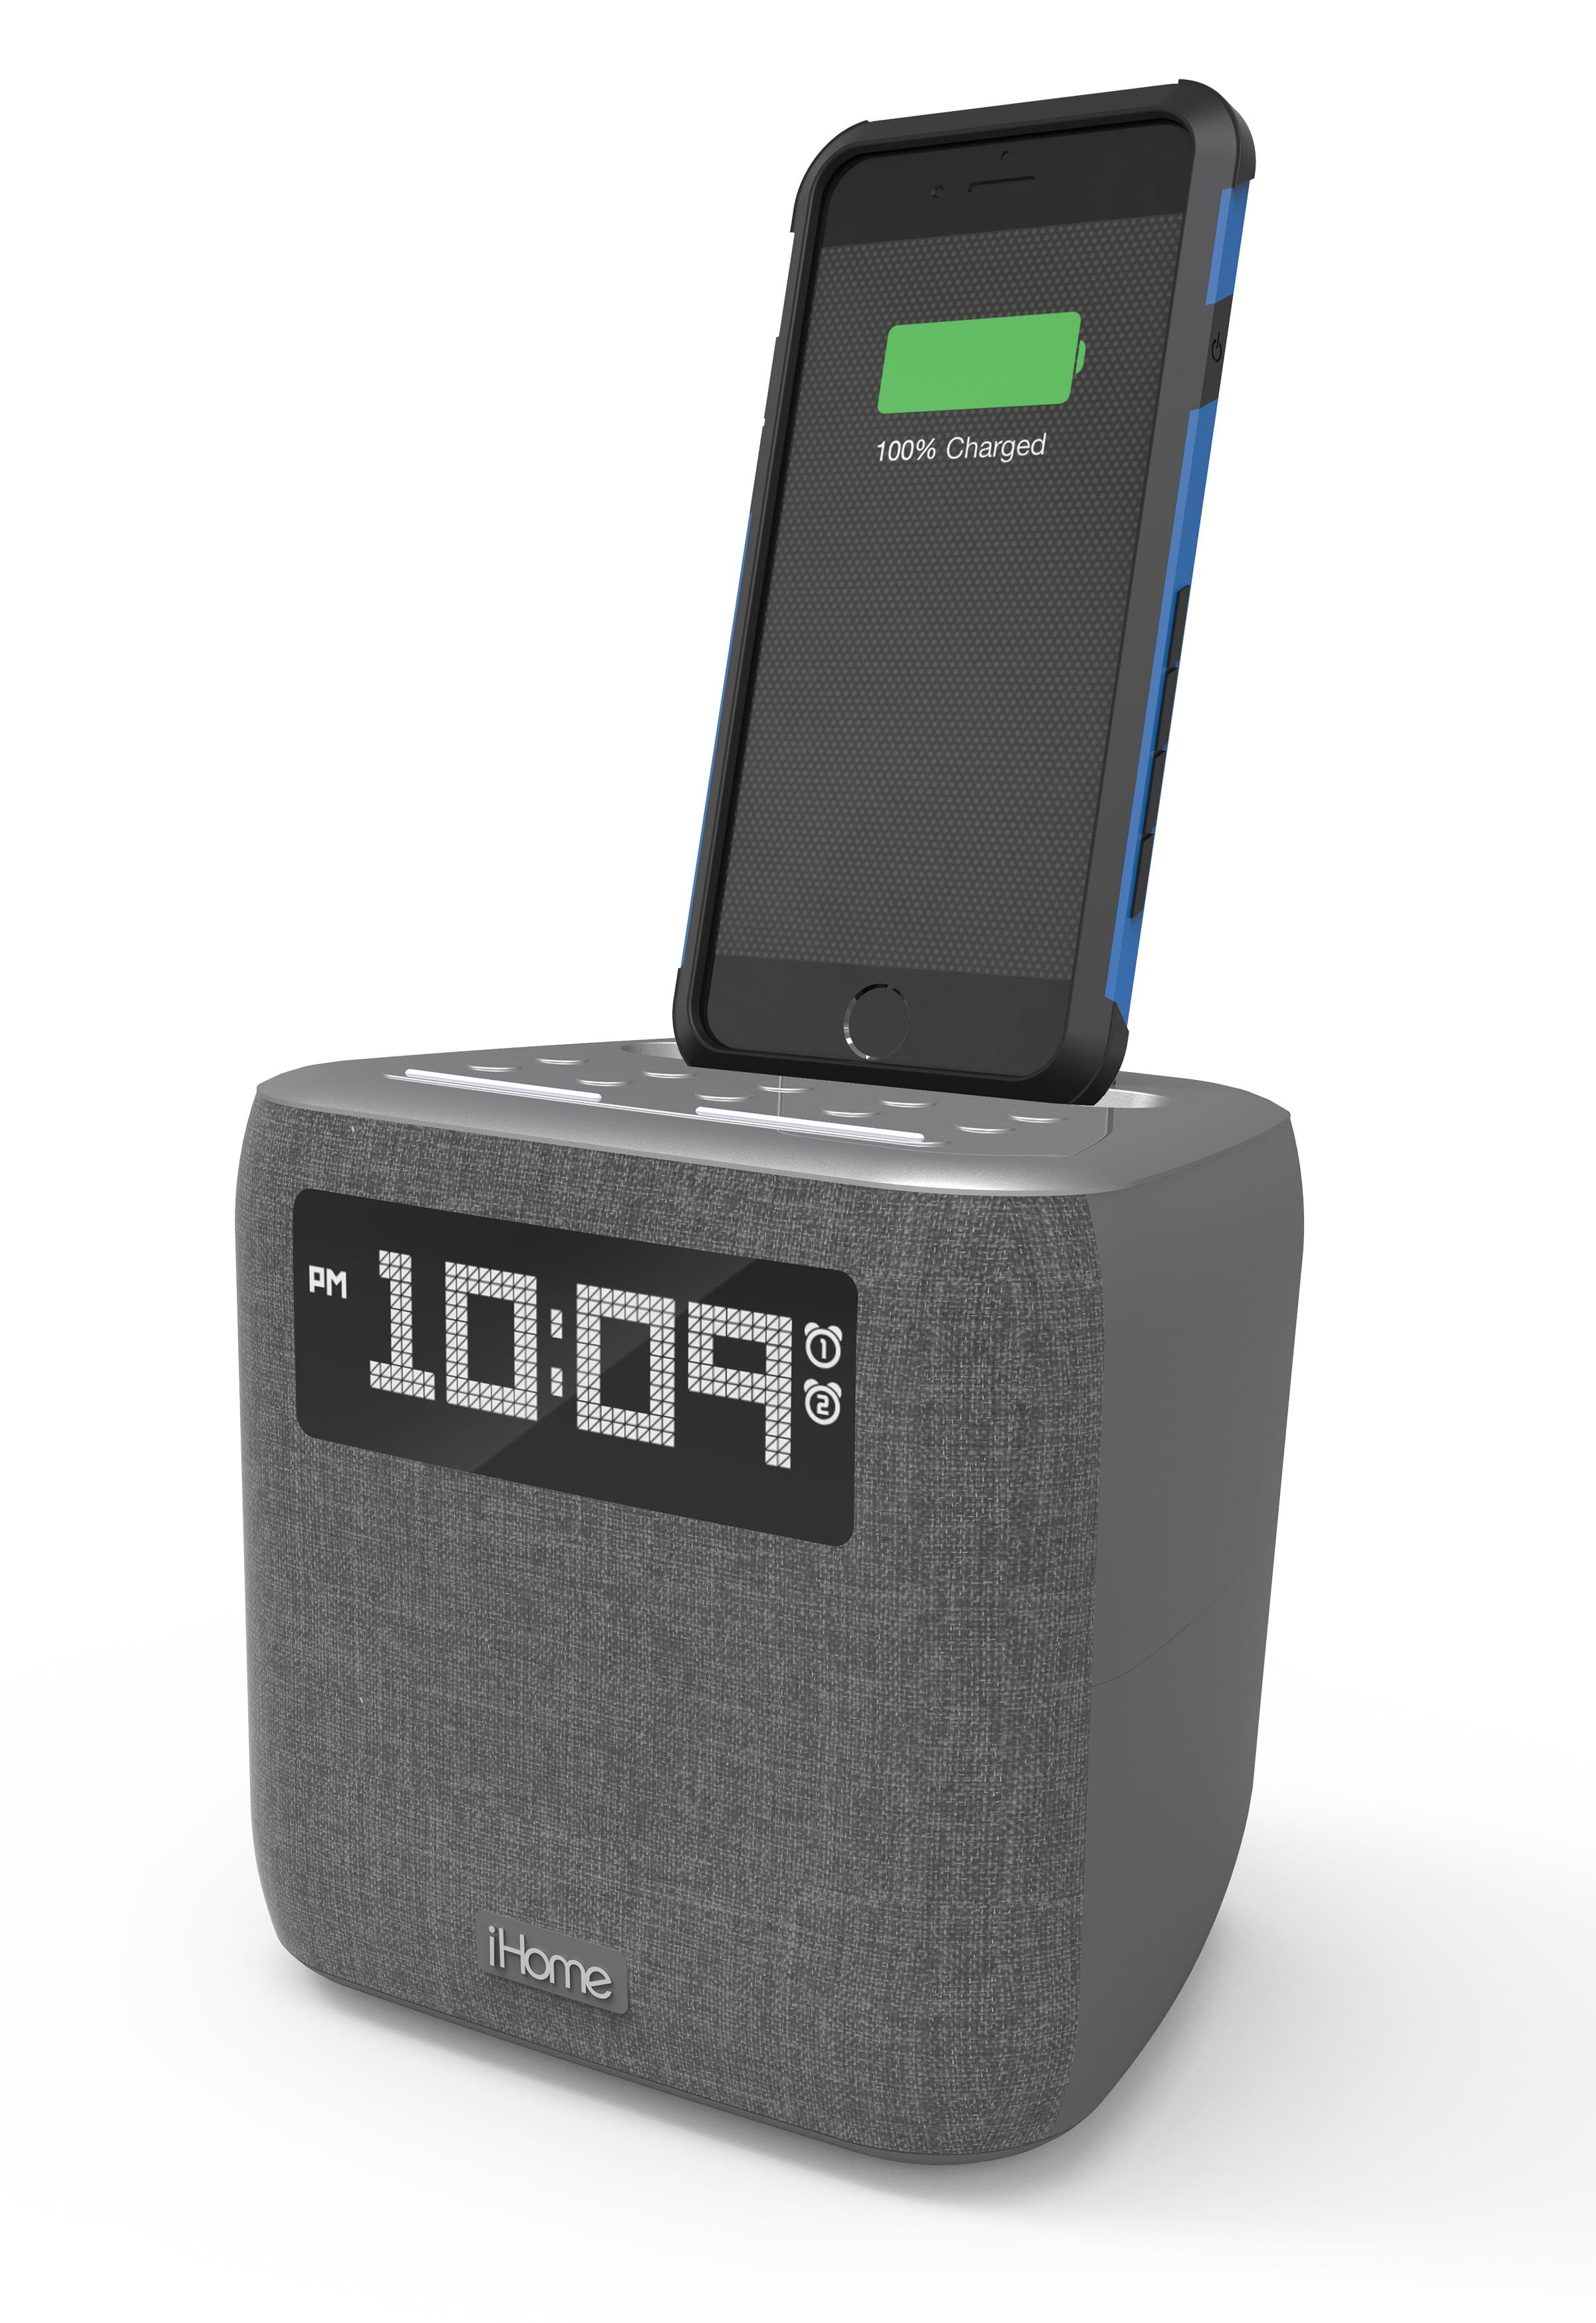 85569d9e358d iHome iPL8 Speaker System with Lightning Dock and Alarm - Walmart.com